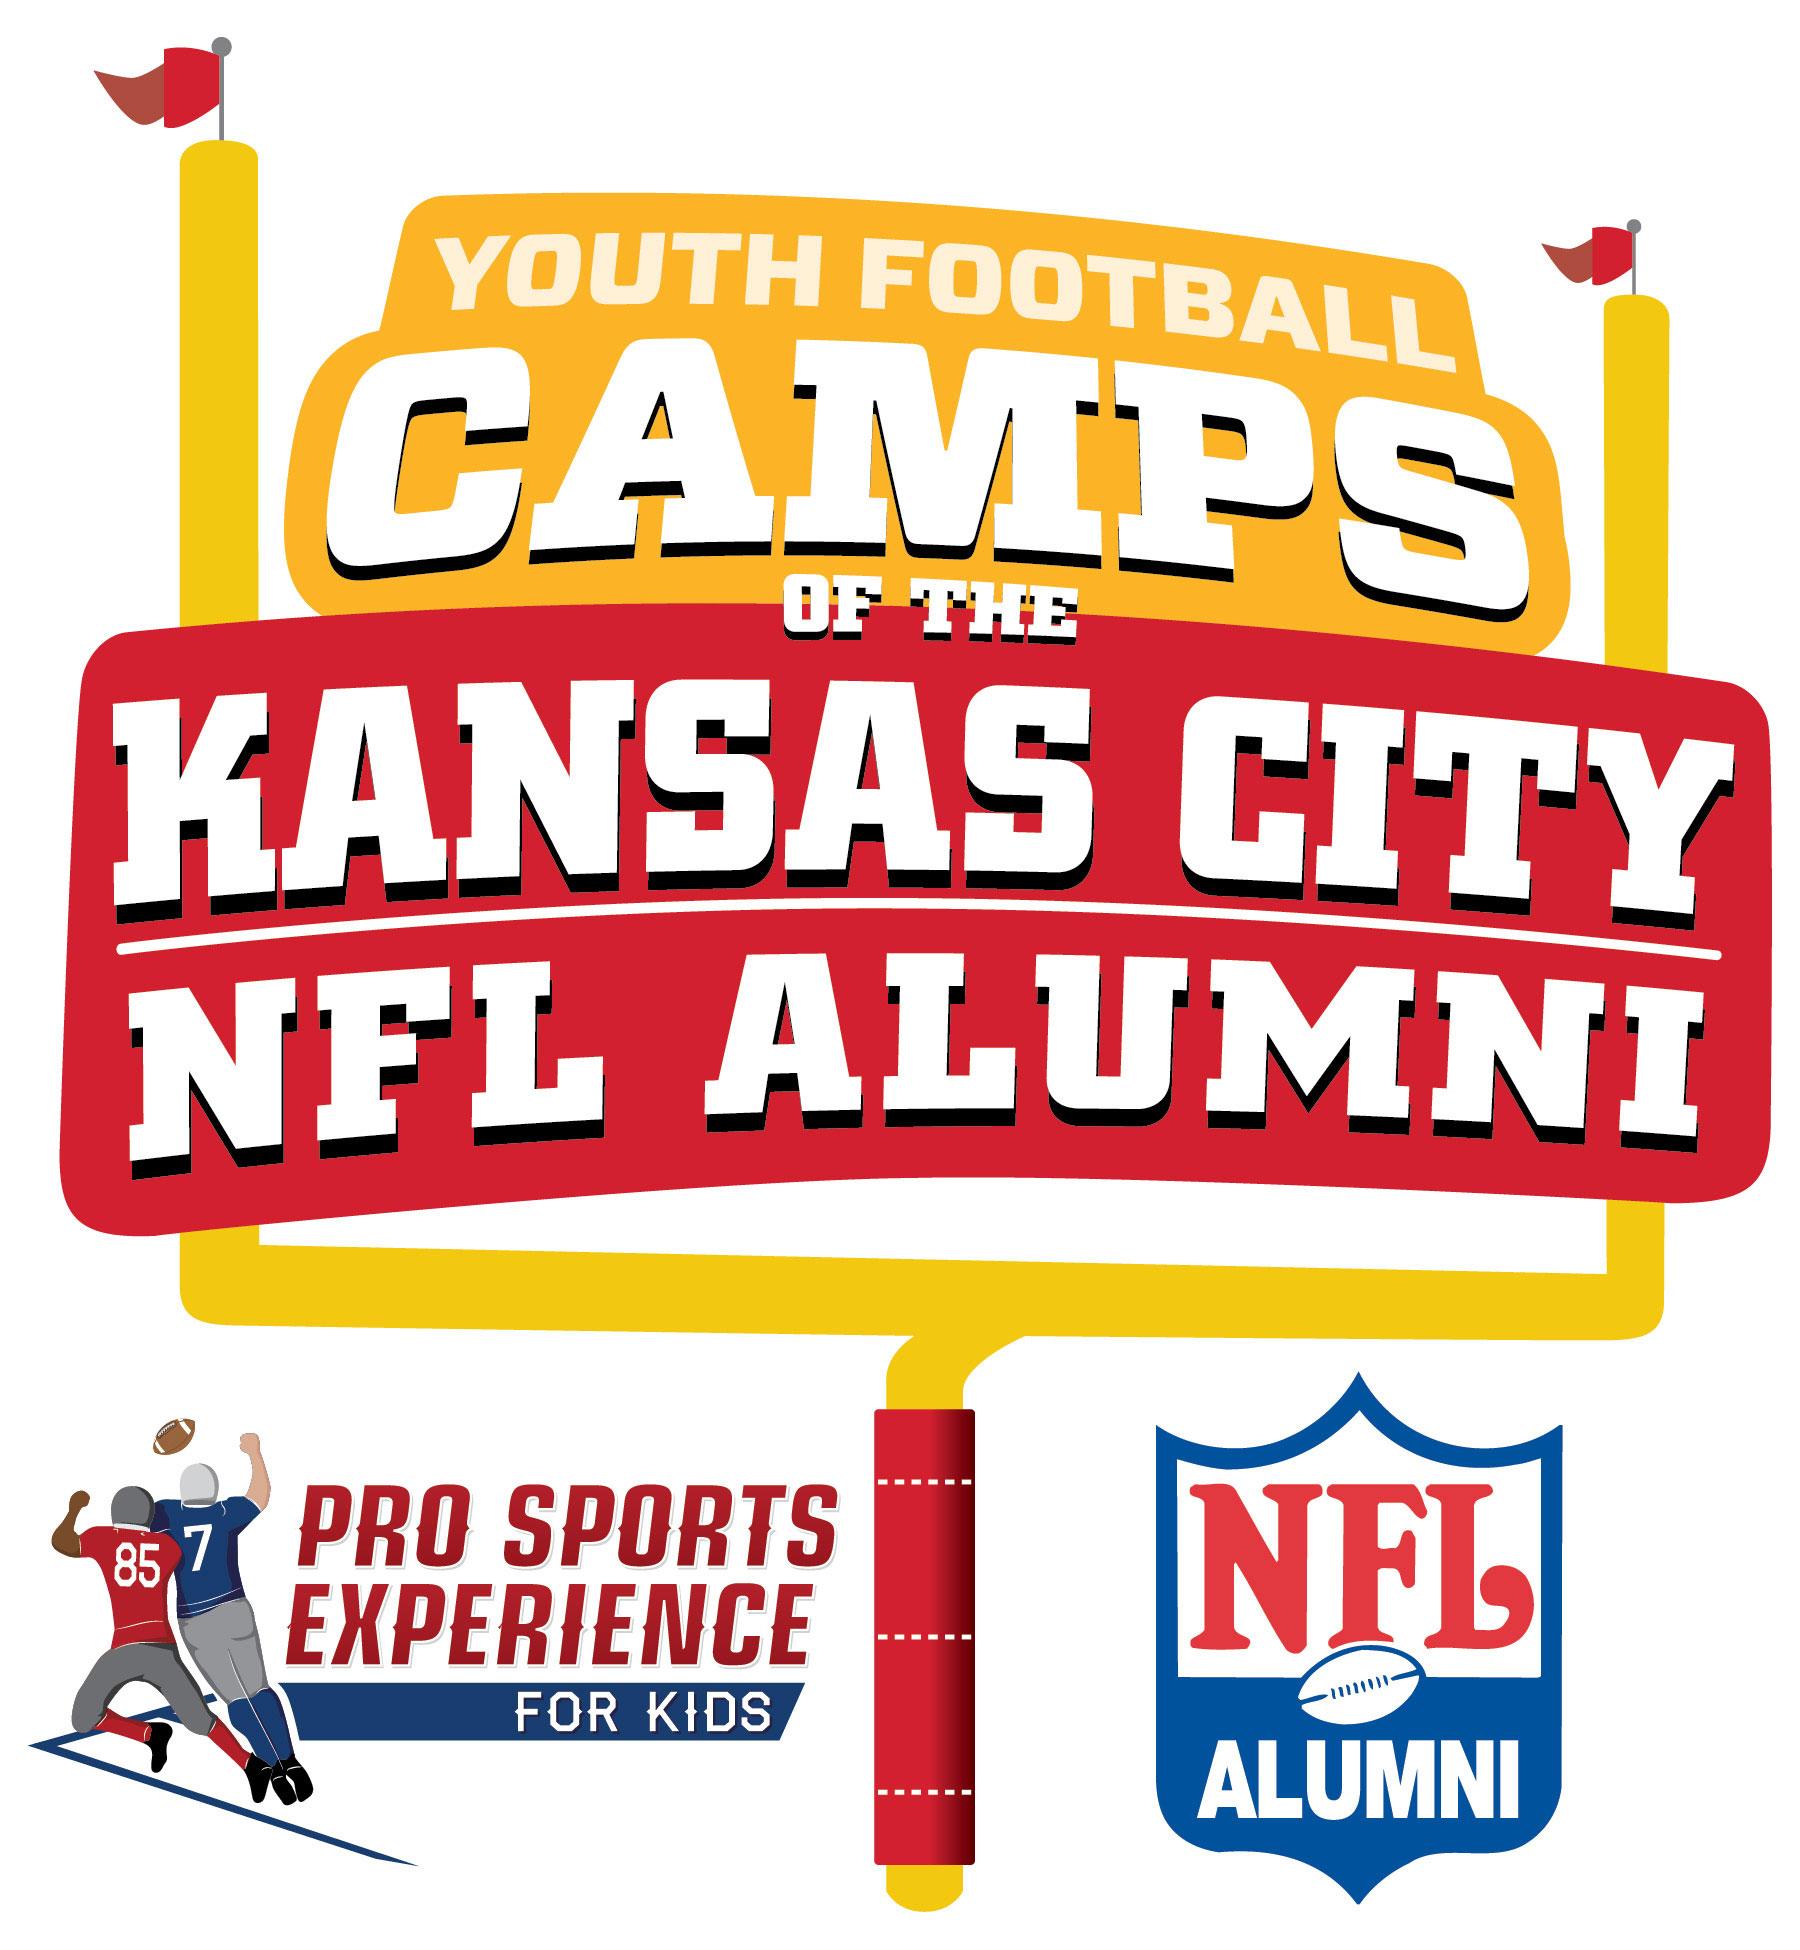 Kansas City NFL Alumni Hero Youth Football Camps - Overland Park